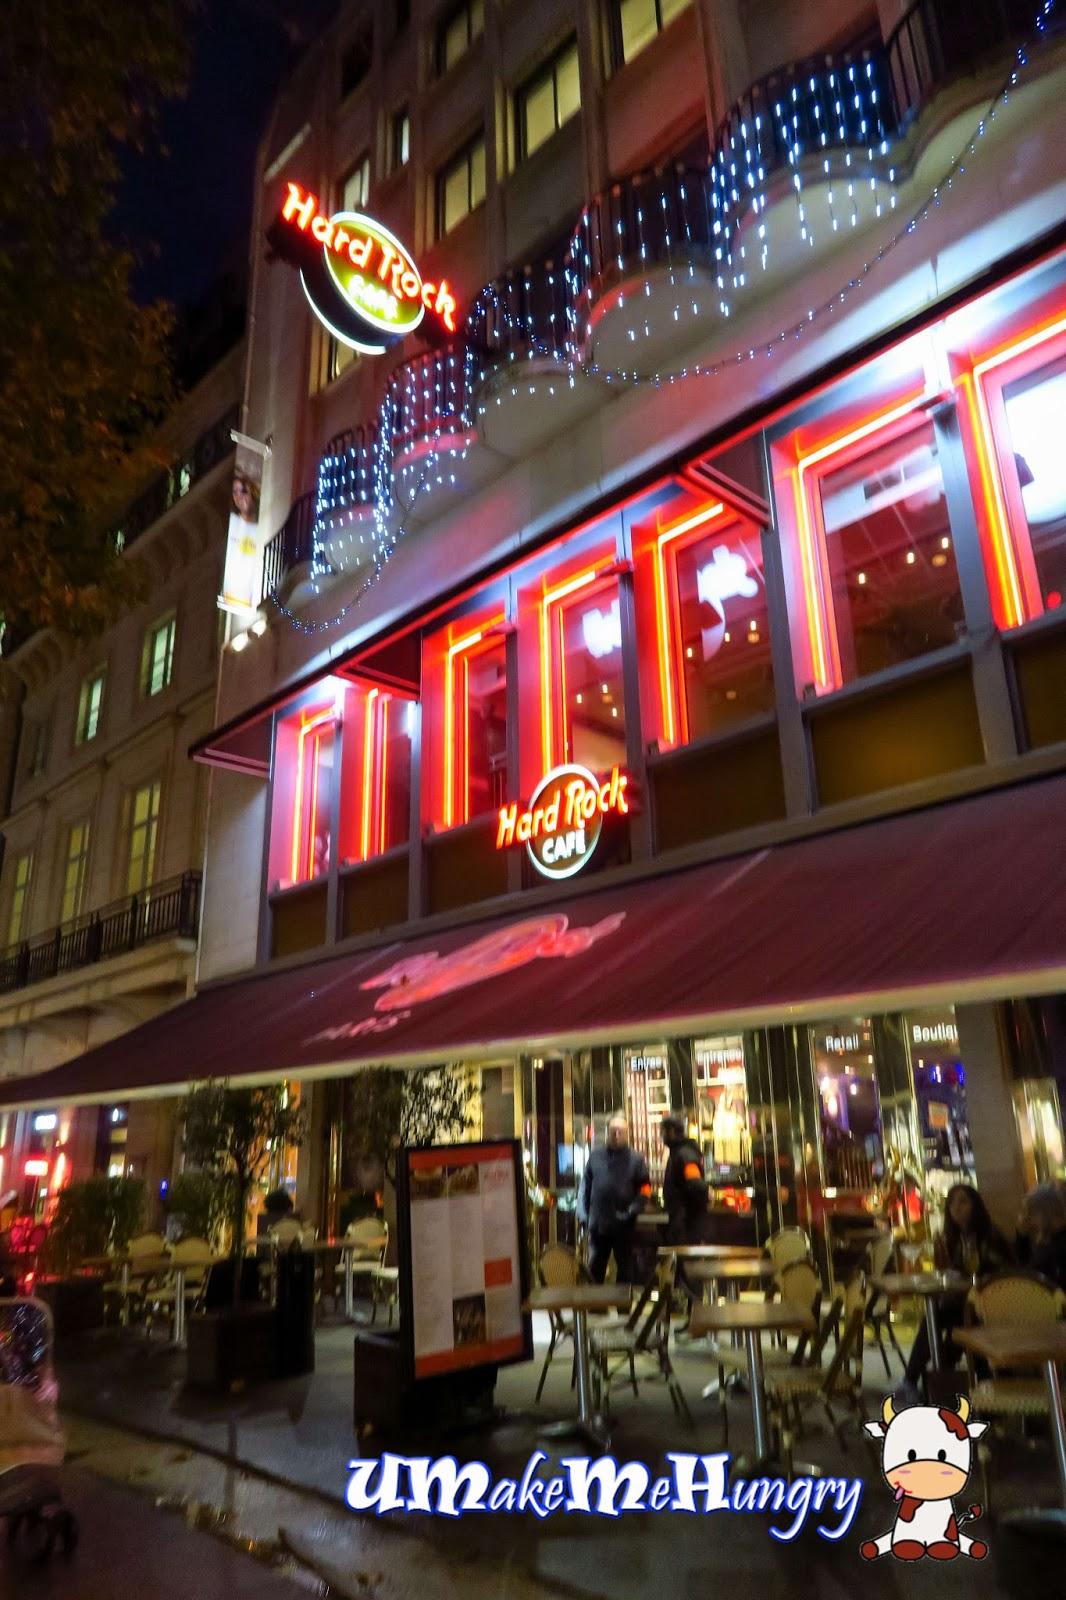 Securities in Paris had been tightened after various ...